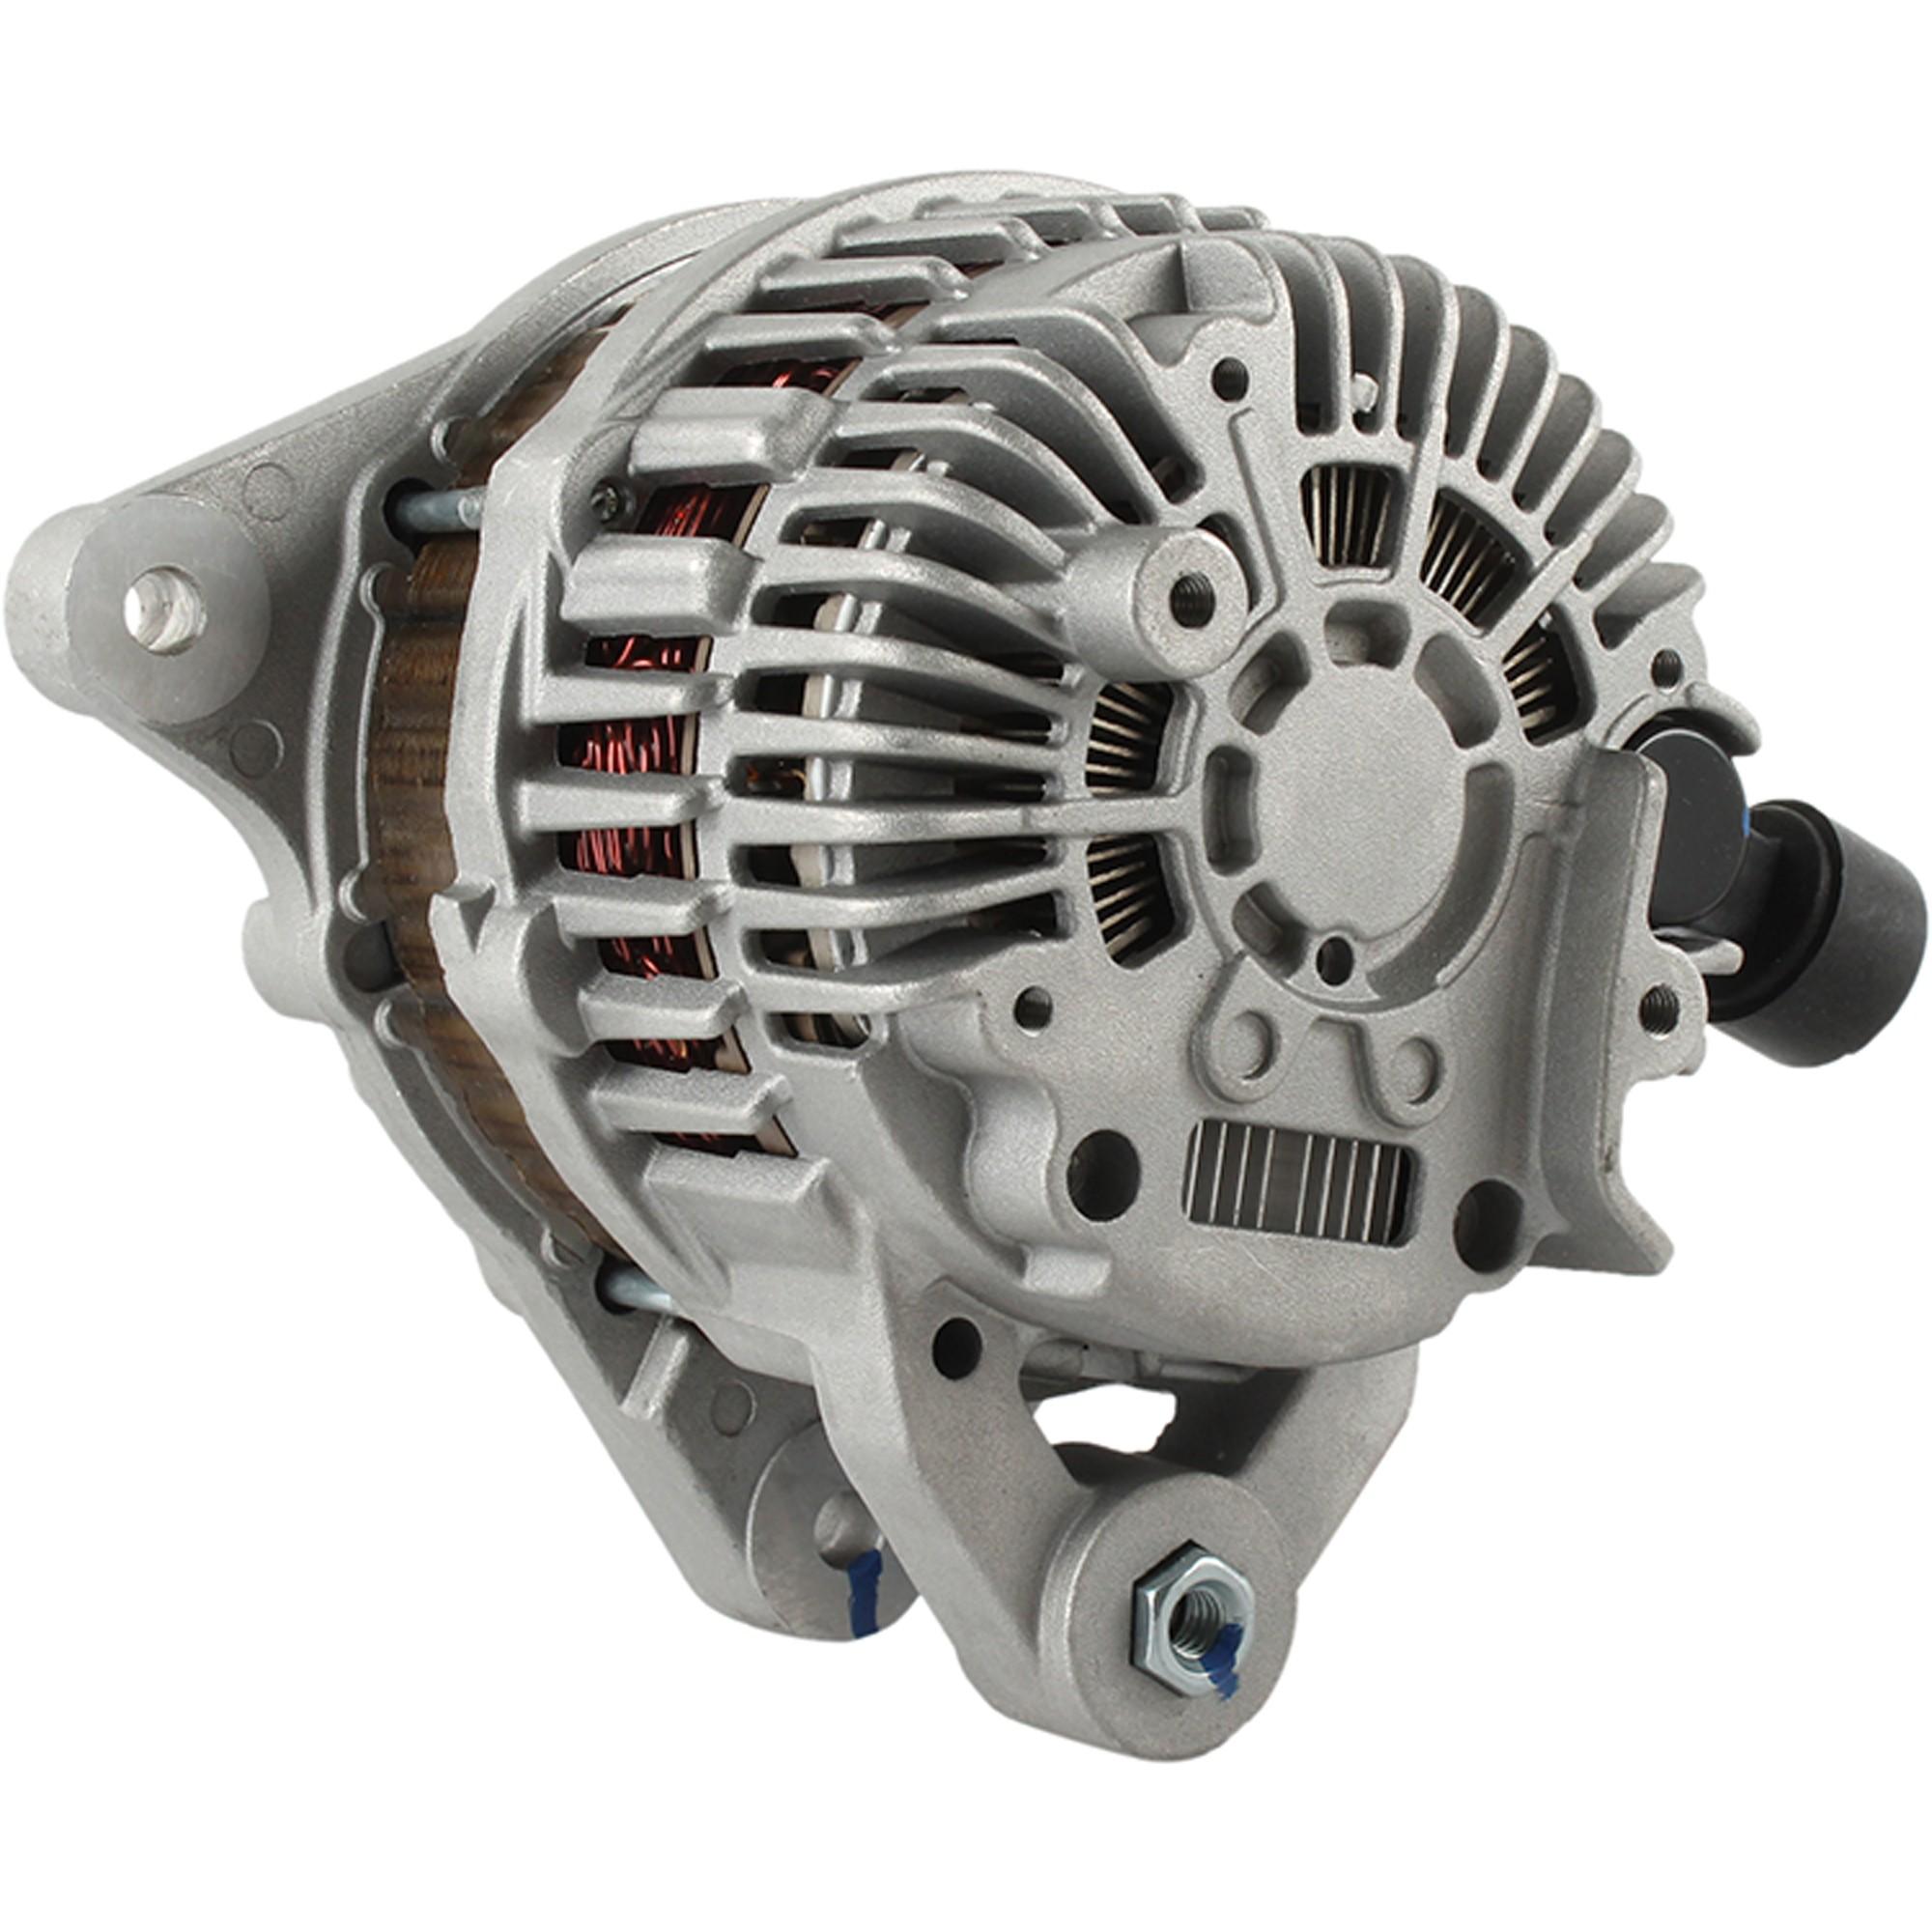 11537 NEW-Alternator-Fits-Honda-Civic-1-8L-2012-2013-2014-2015